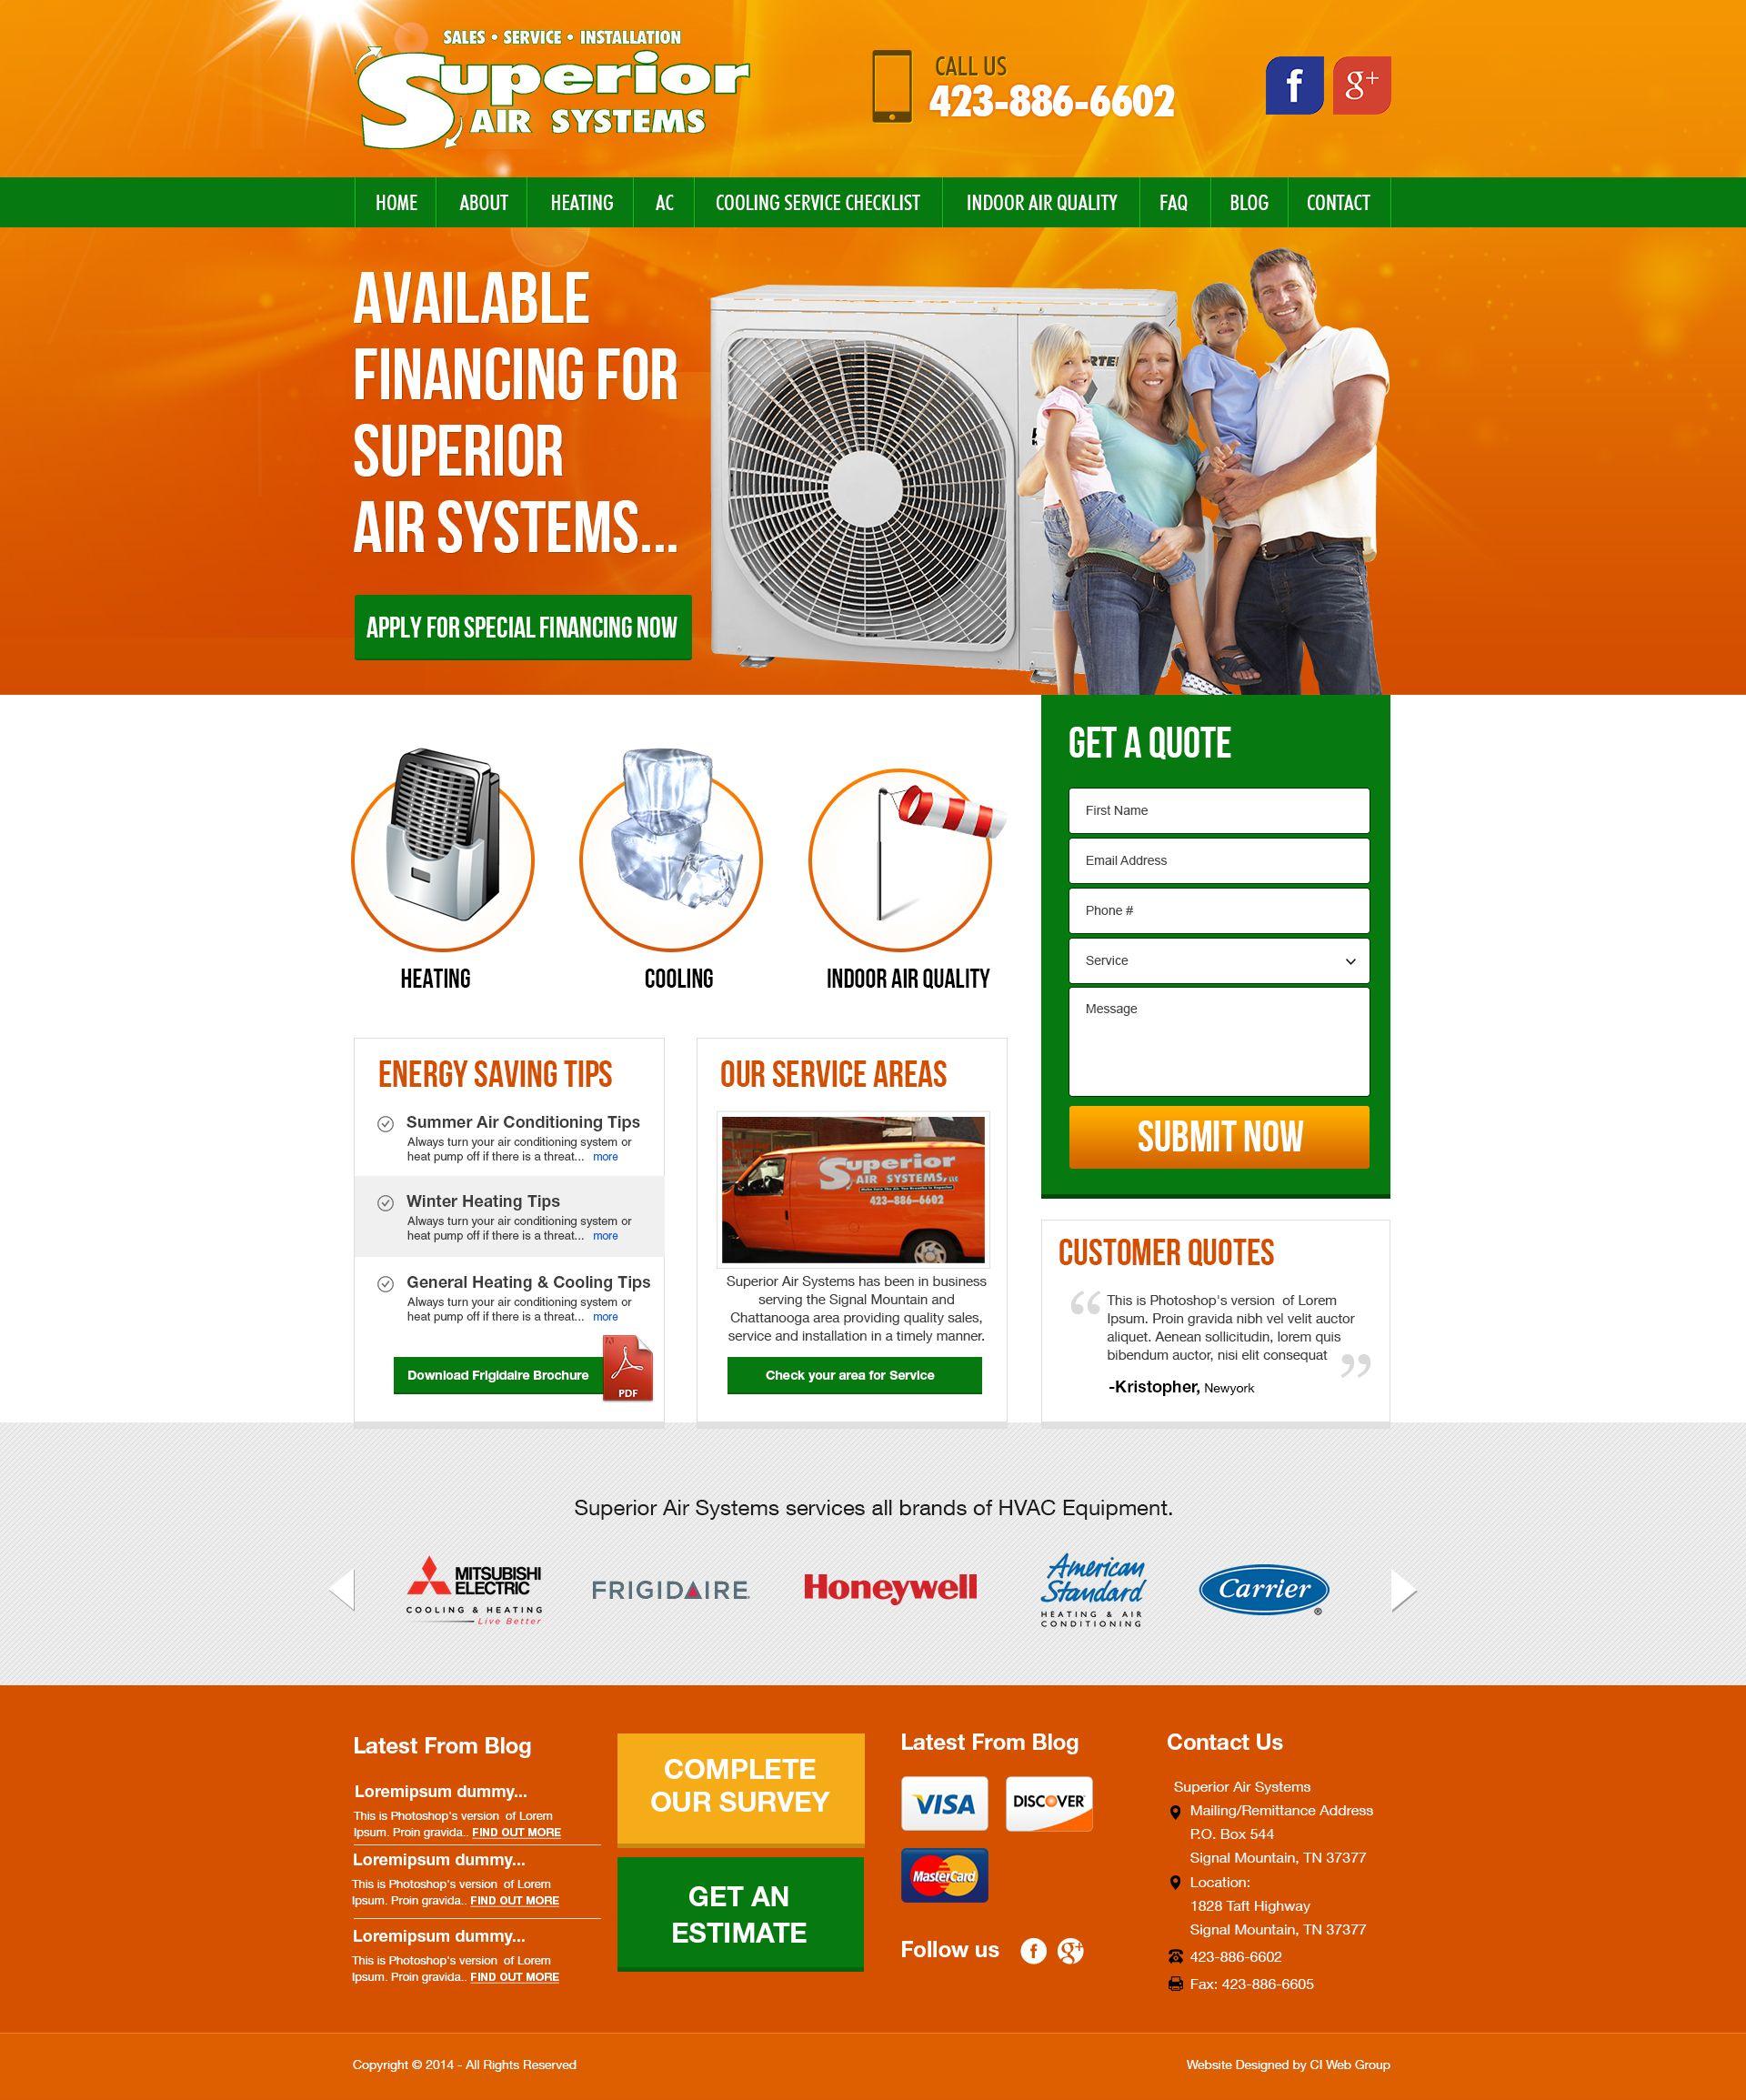 Web Design Heating Services Energy Saving Tips Save Energy